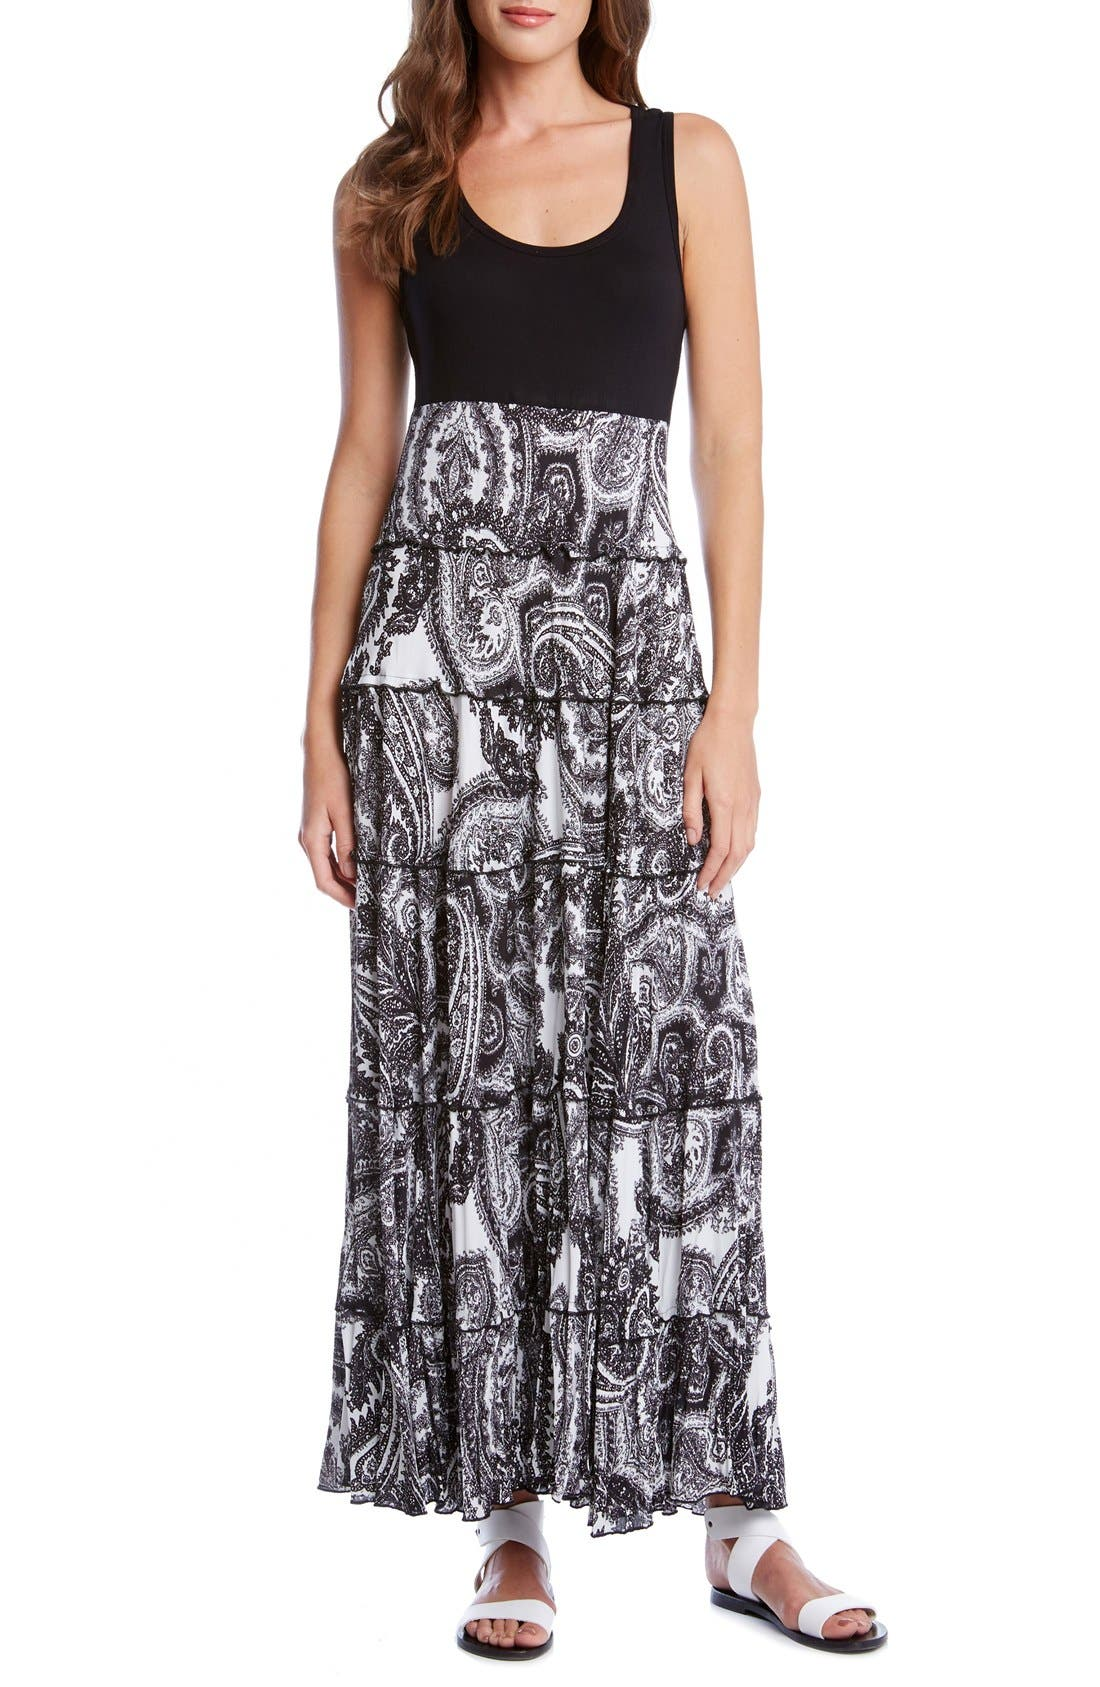 Alternate Image 1 Selected - Karen Kane Paisley Print Mixed Media Tiered Maxi Dress